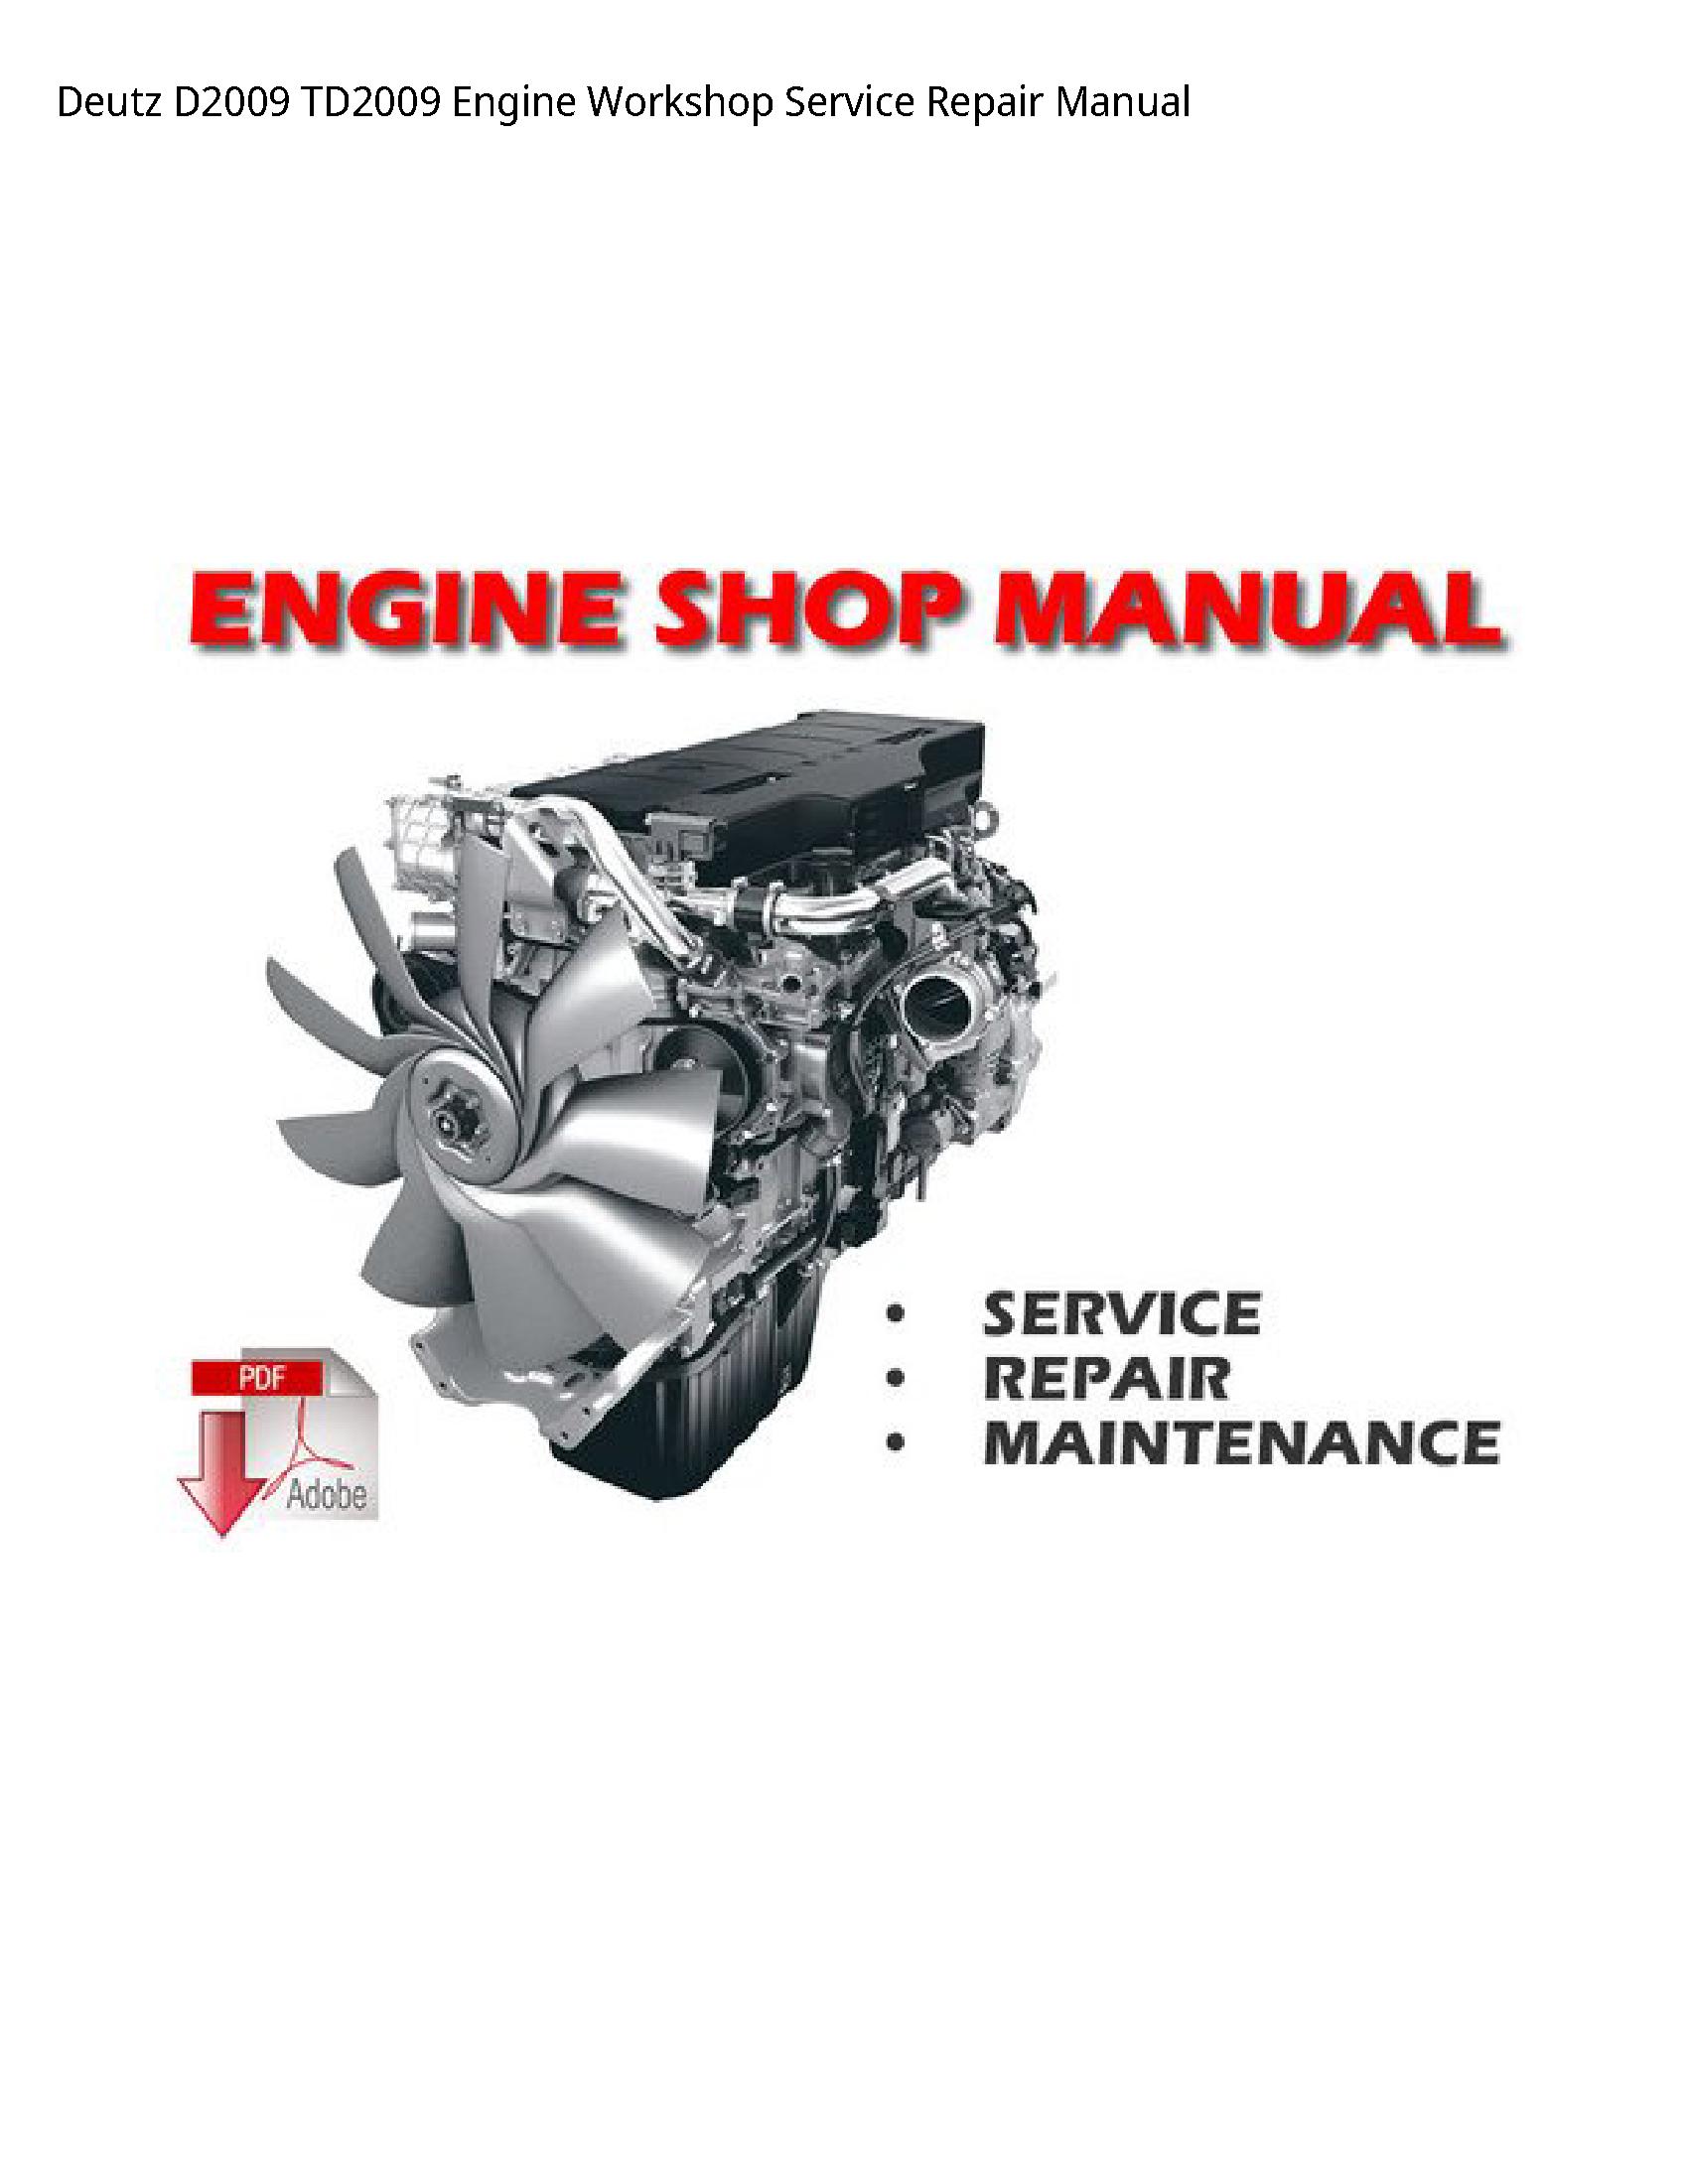 Deutz D2009 Engine manual